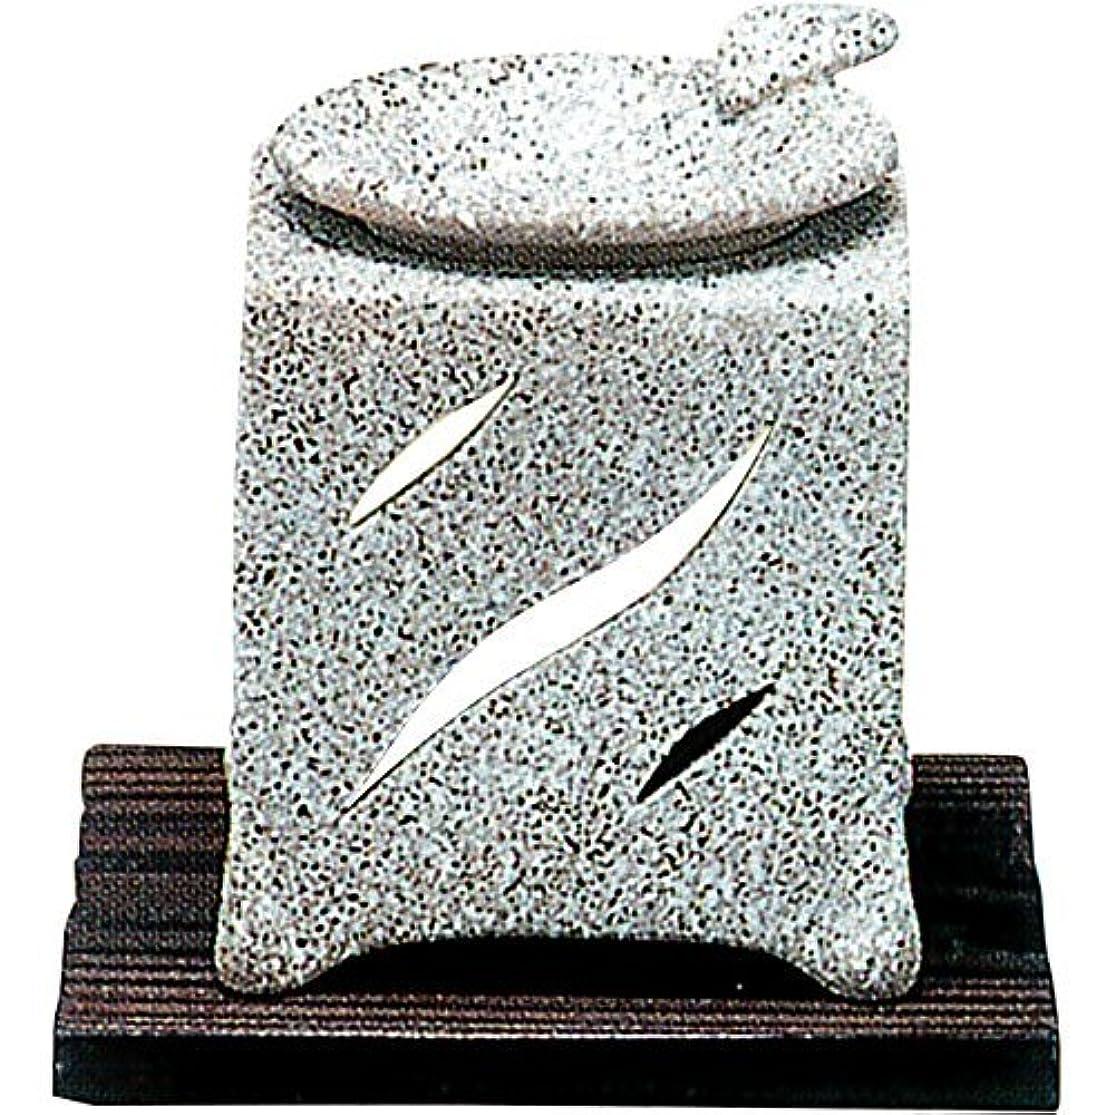 ダイヤル配置寝具常滑焼 5-261 山房石風角形茶香炉 山房10×10×H12㎝